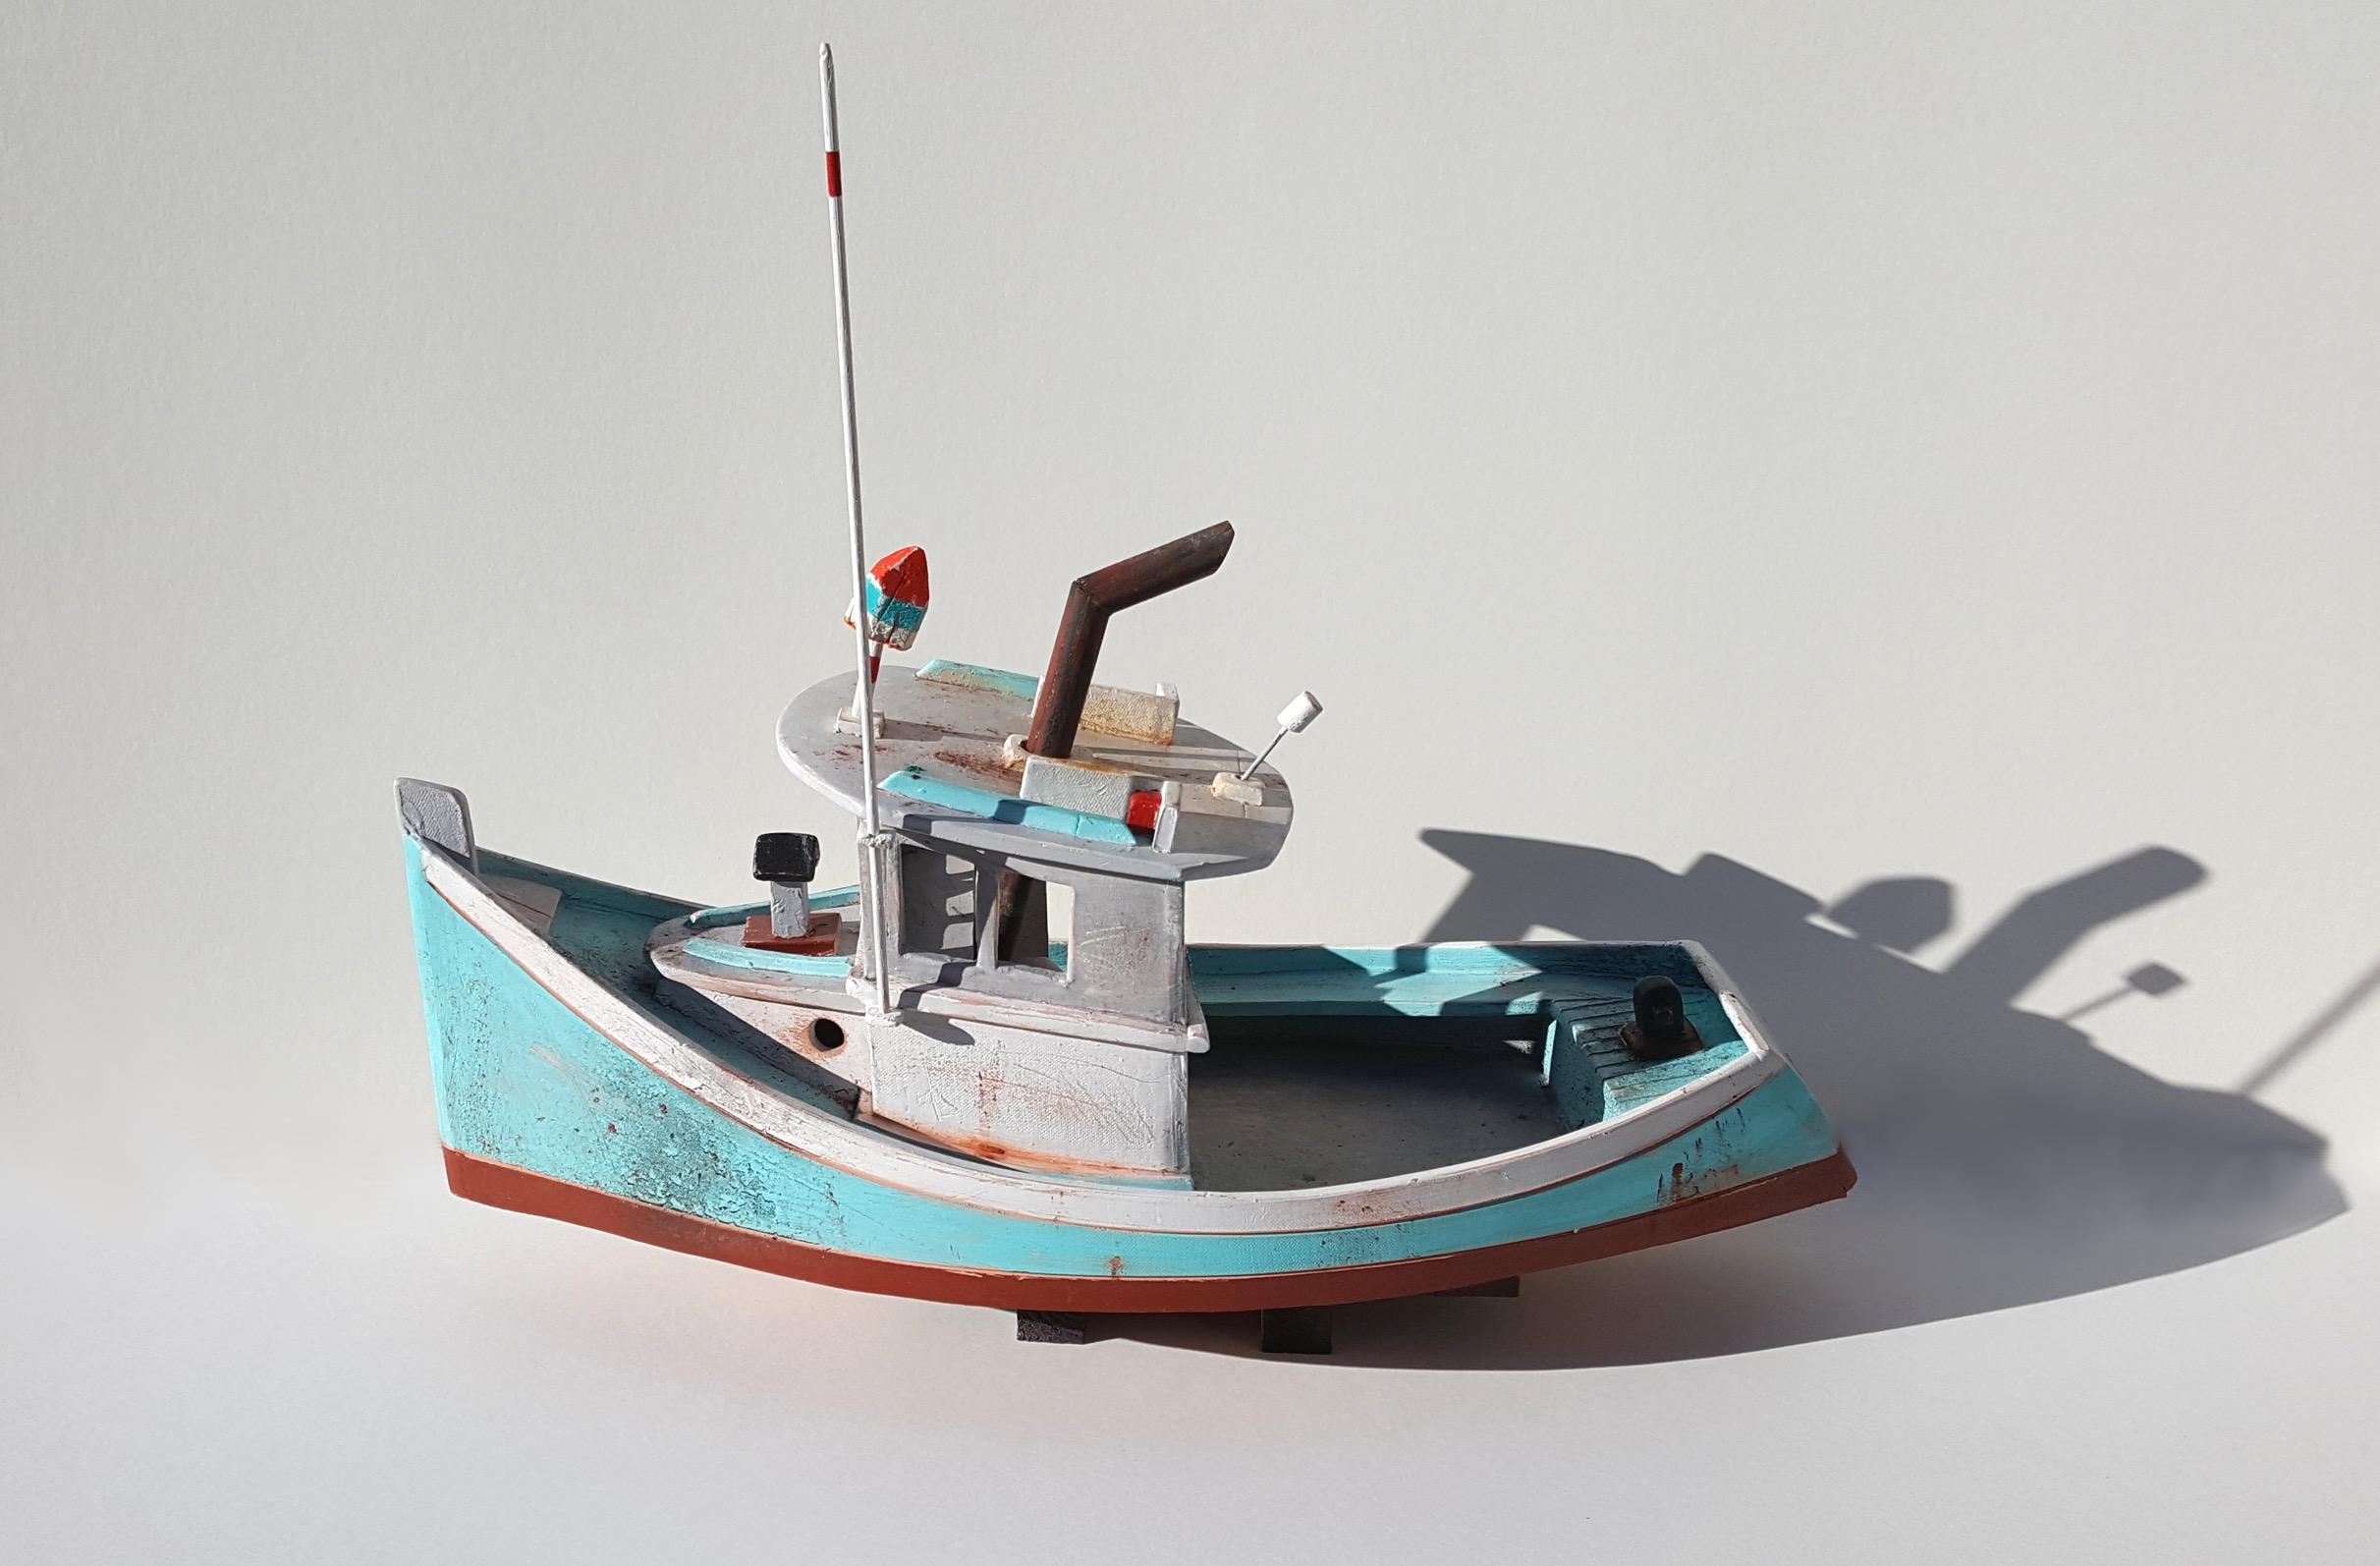 Lobstah Boat